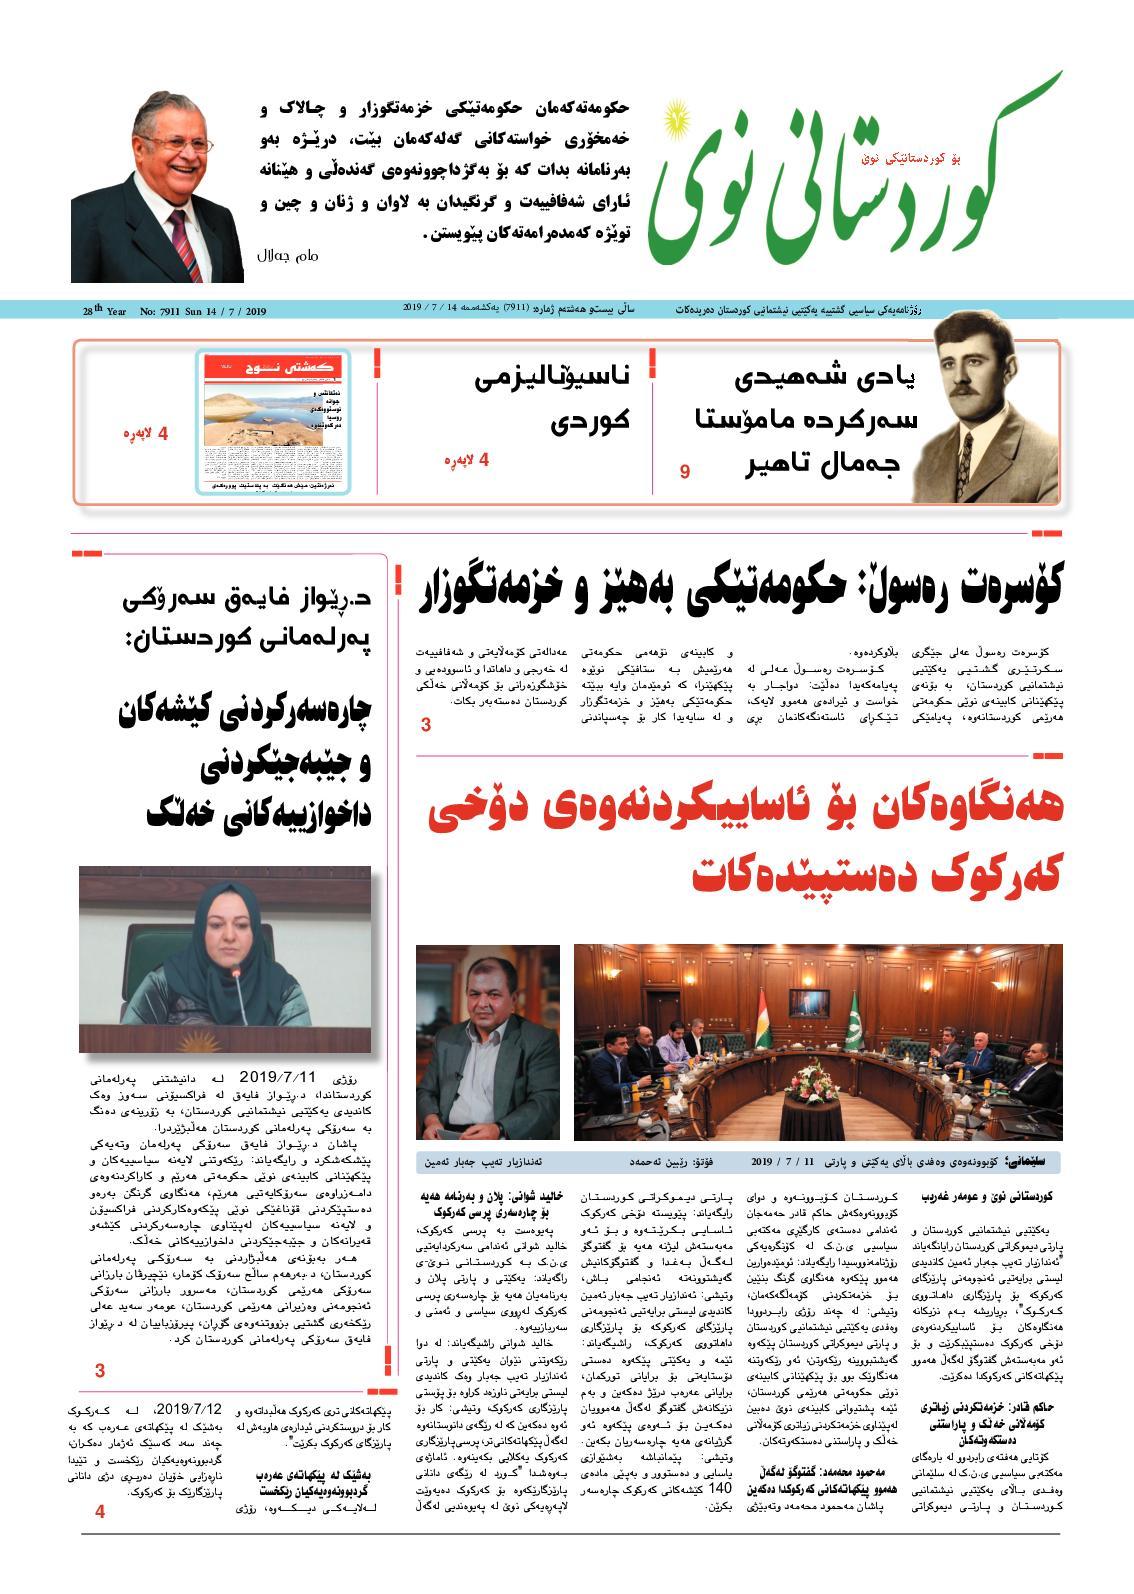 Kurdistani Nwe 14 July 2019